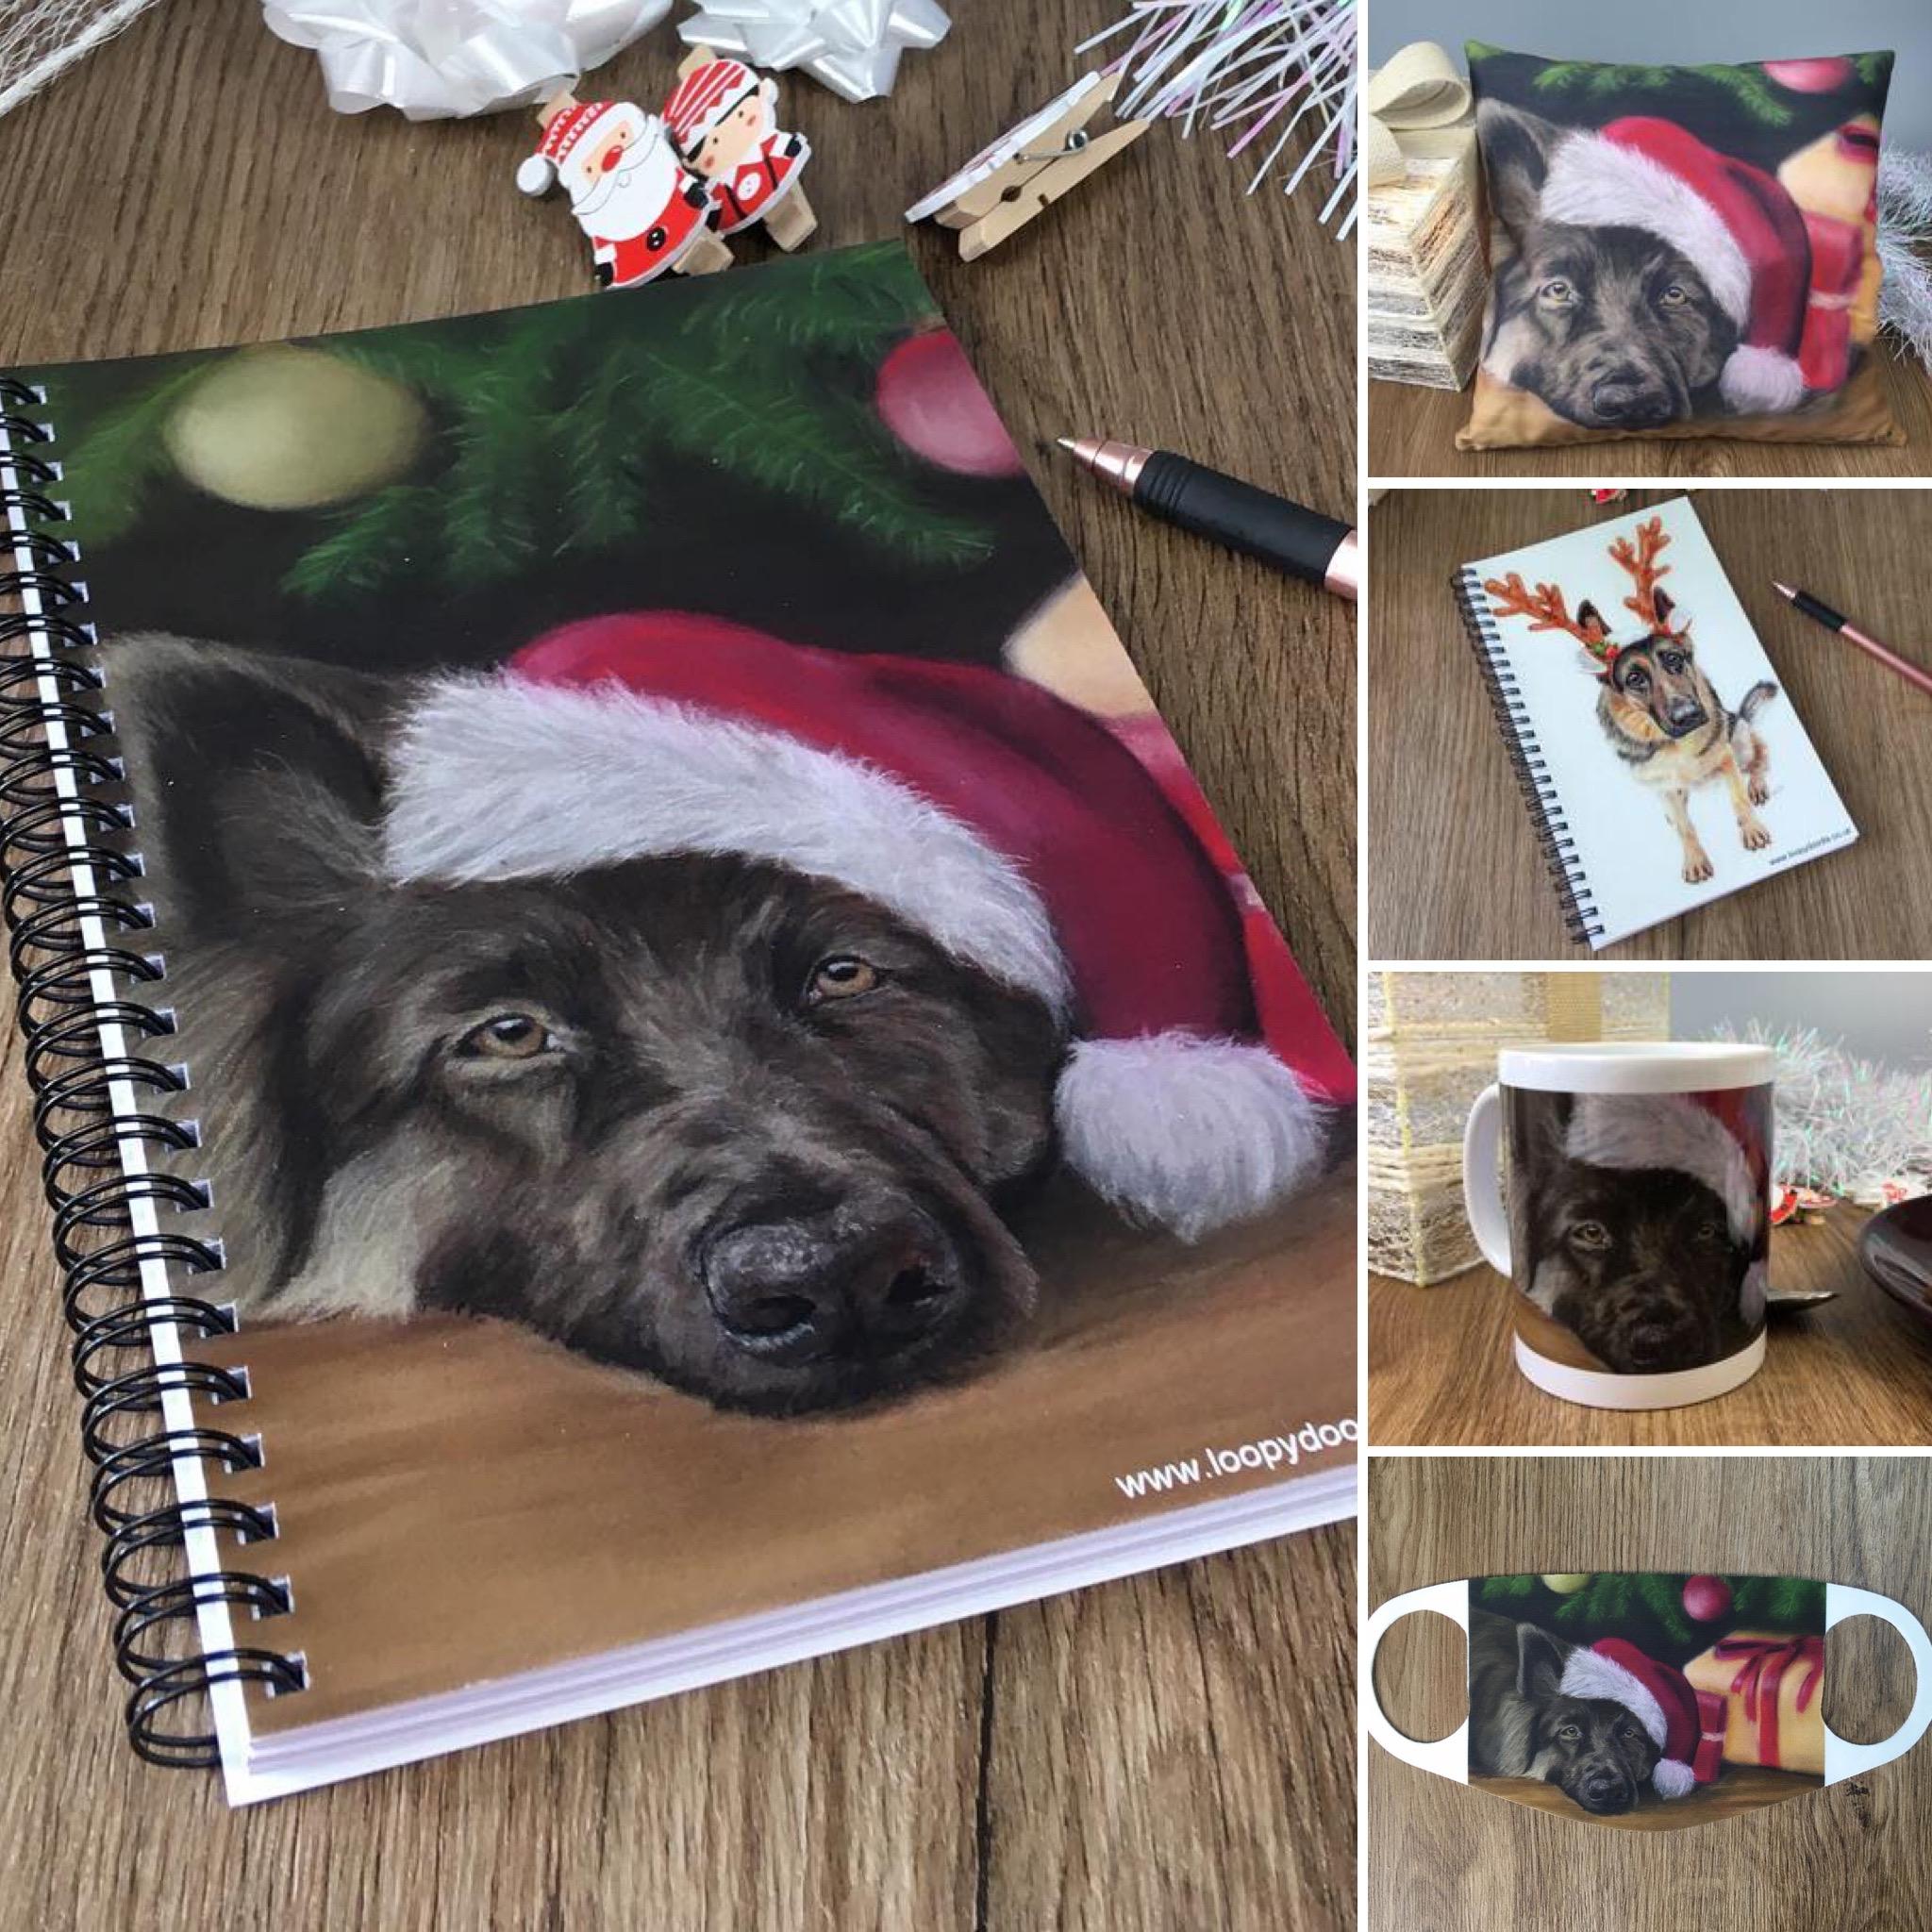 Loopy Doodle Pet Portraits